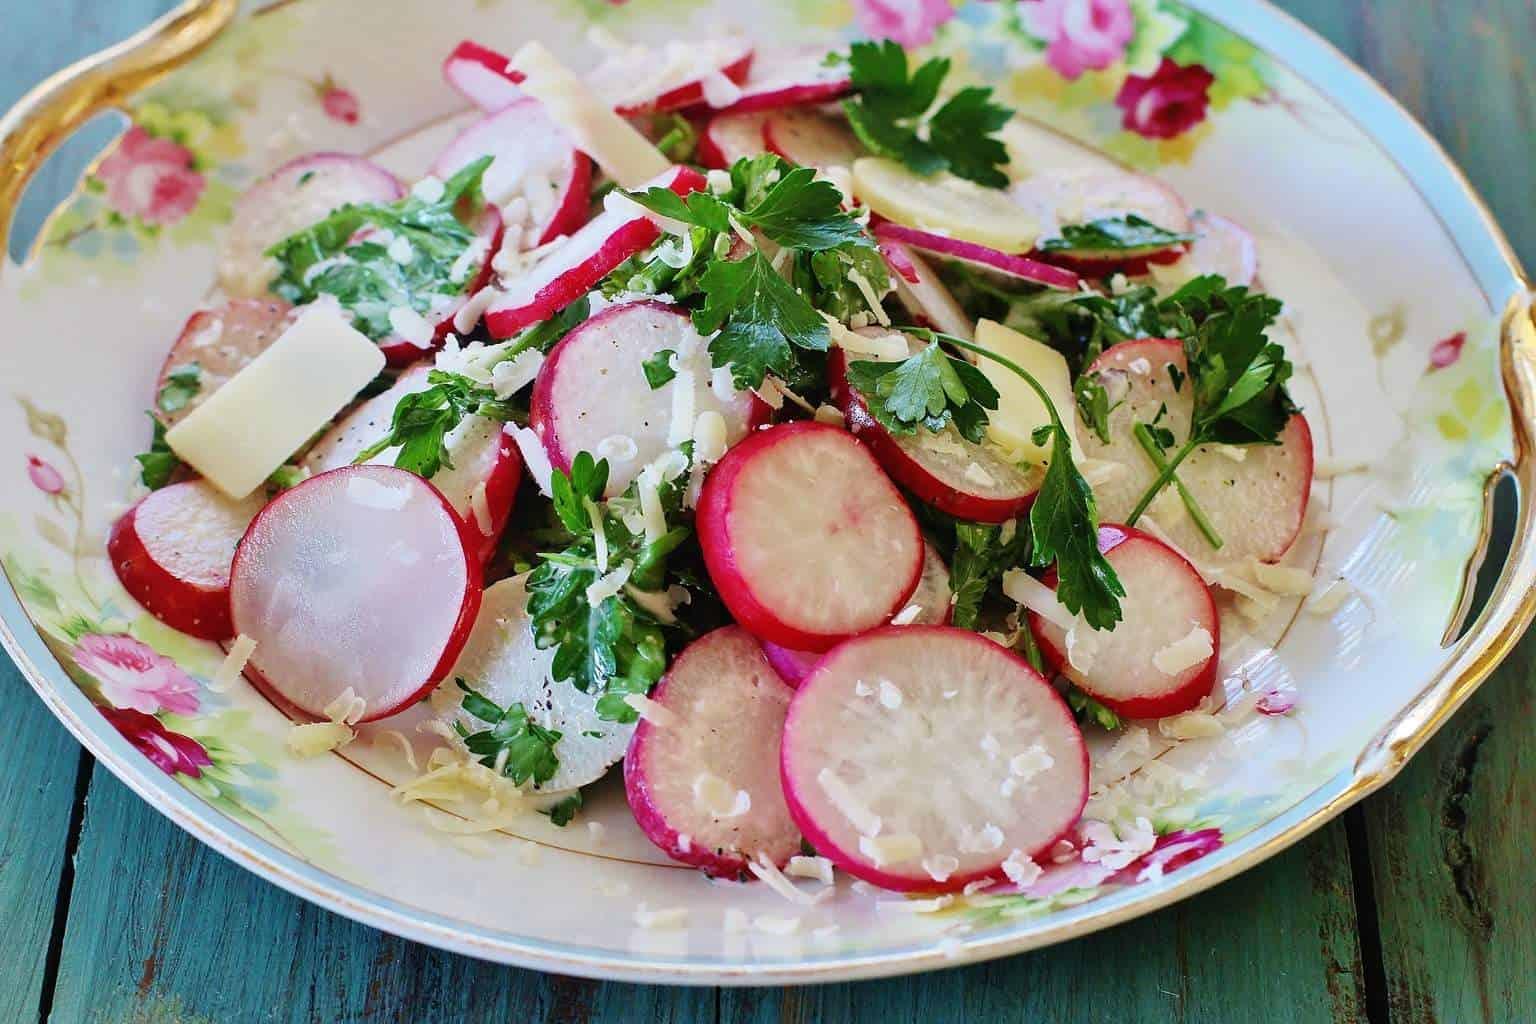 Easter Egg Radish Salad